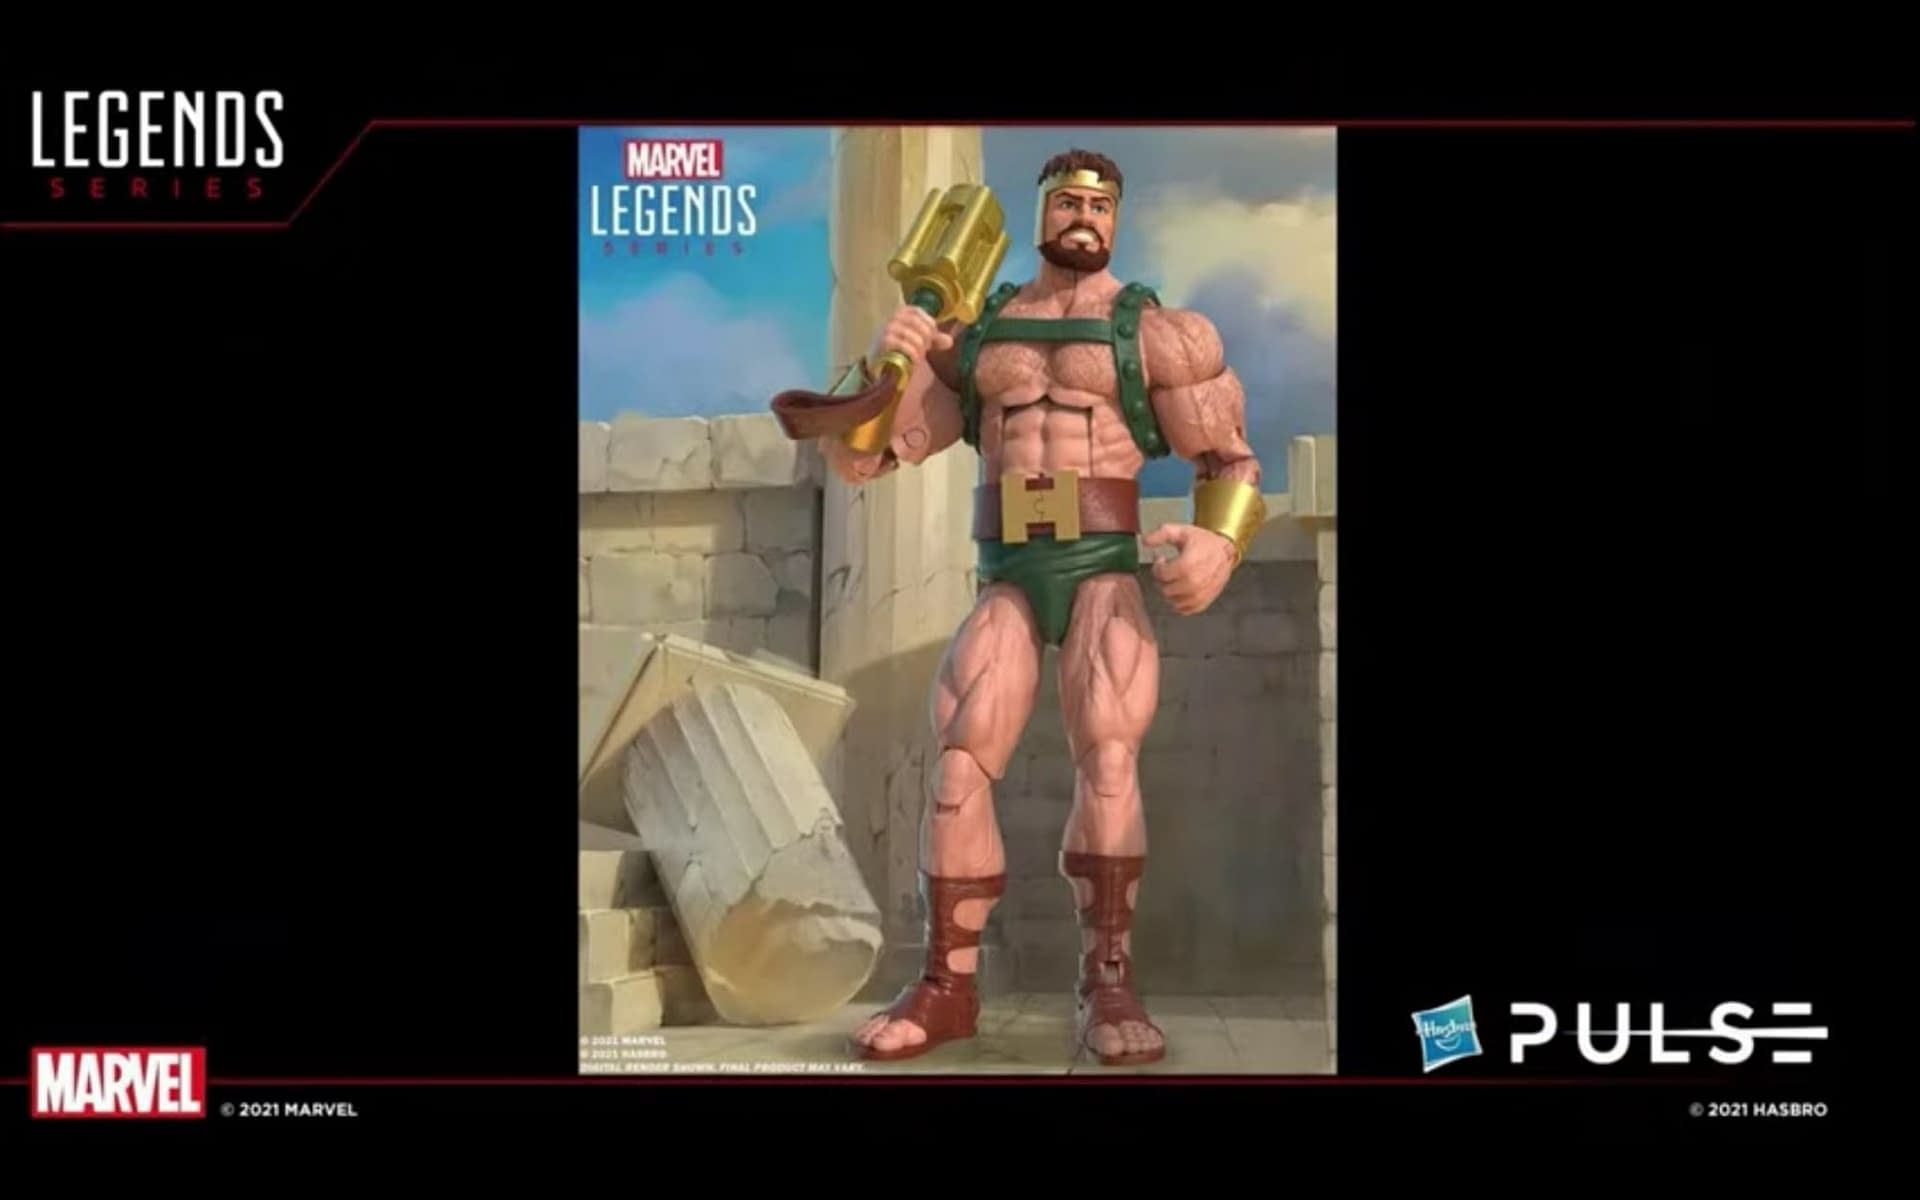 Marvel Legends Reveals: Shang-Chi, Disney+ Shows, & Comic Figures